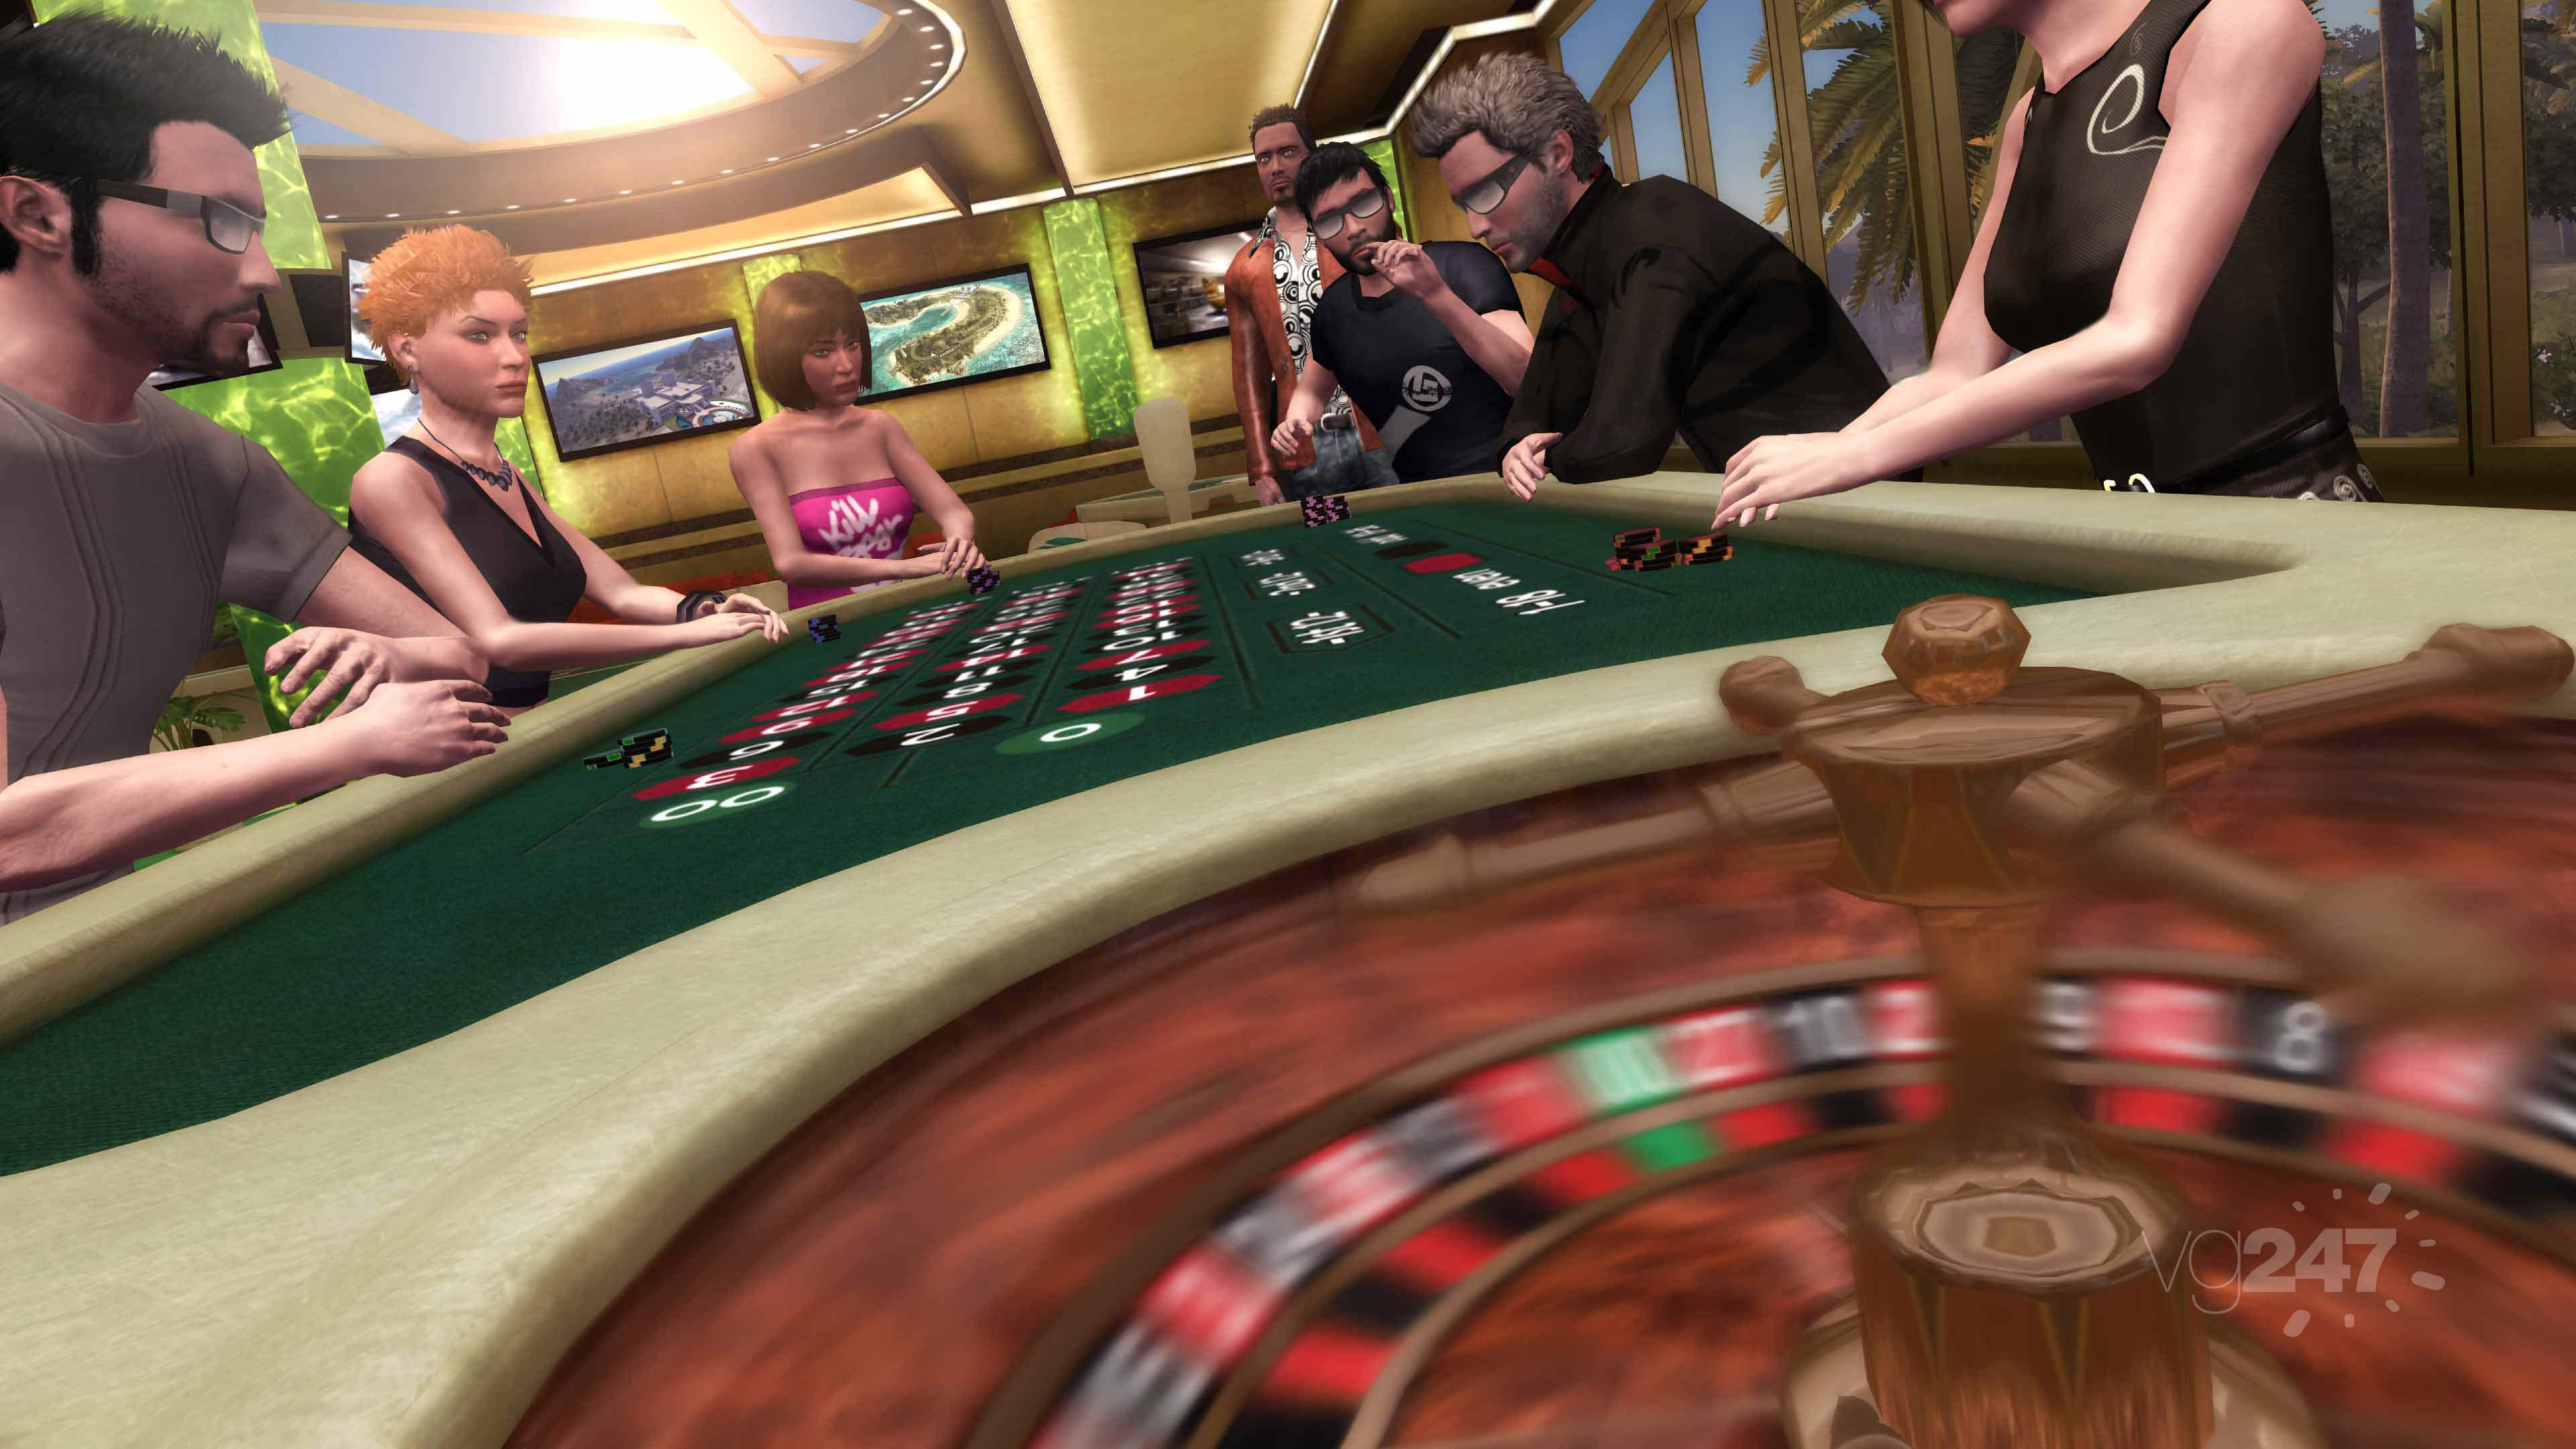 Dbt gambling